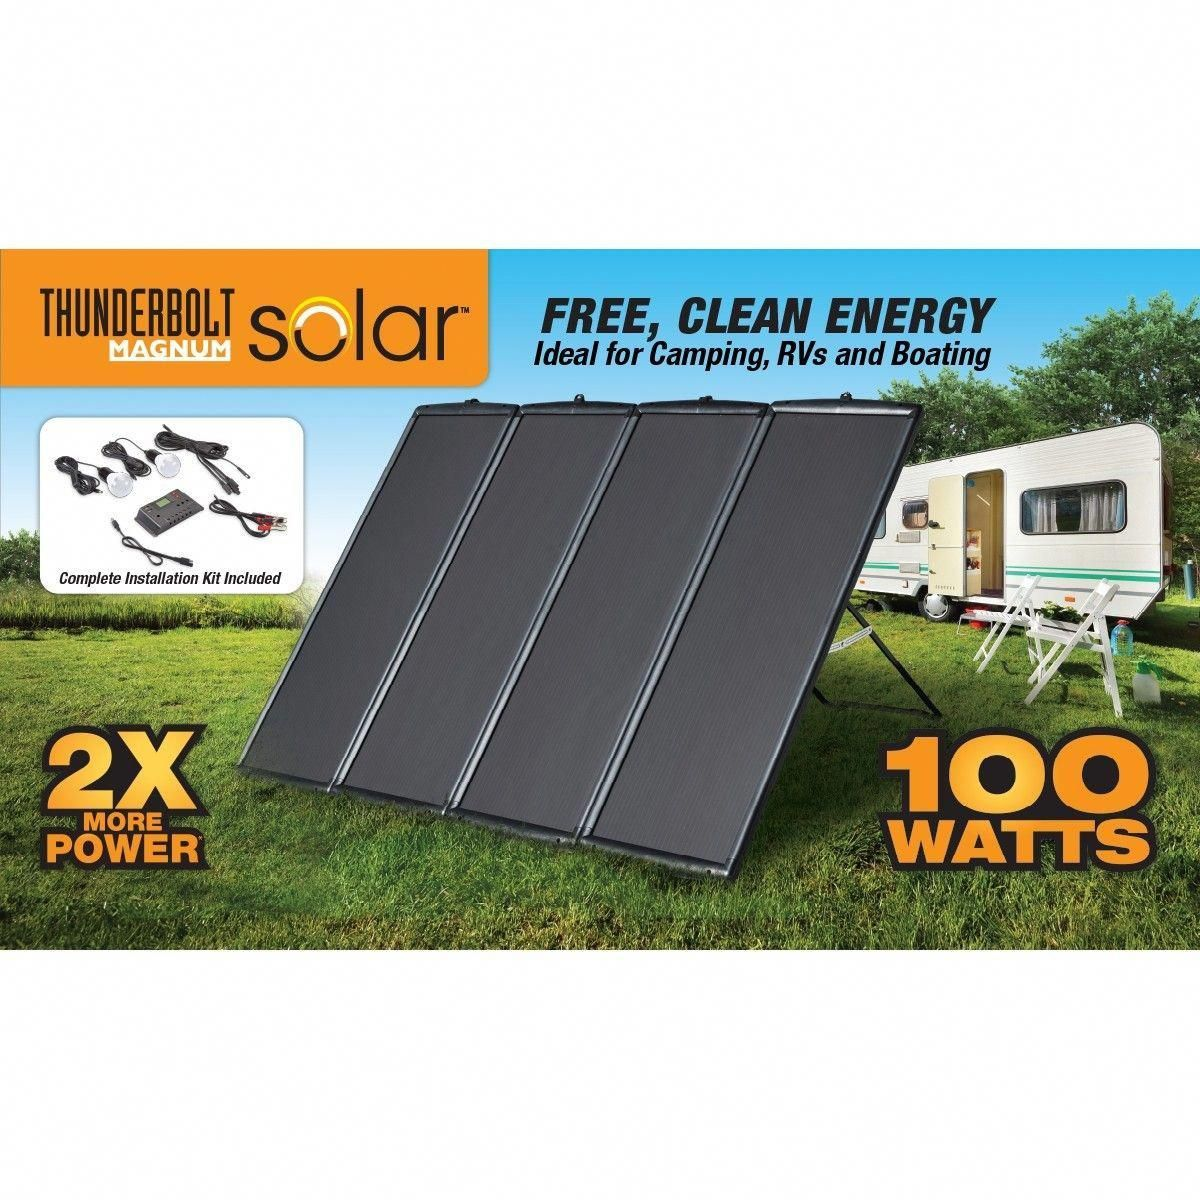 100 Watt Solar Panel Kit In 2020 Best Solar Panels Solar Heating Solar Technology